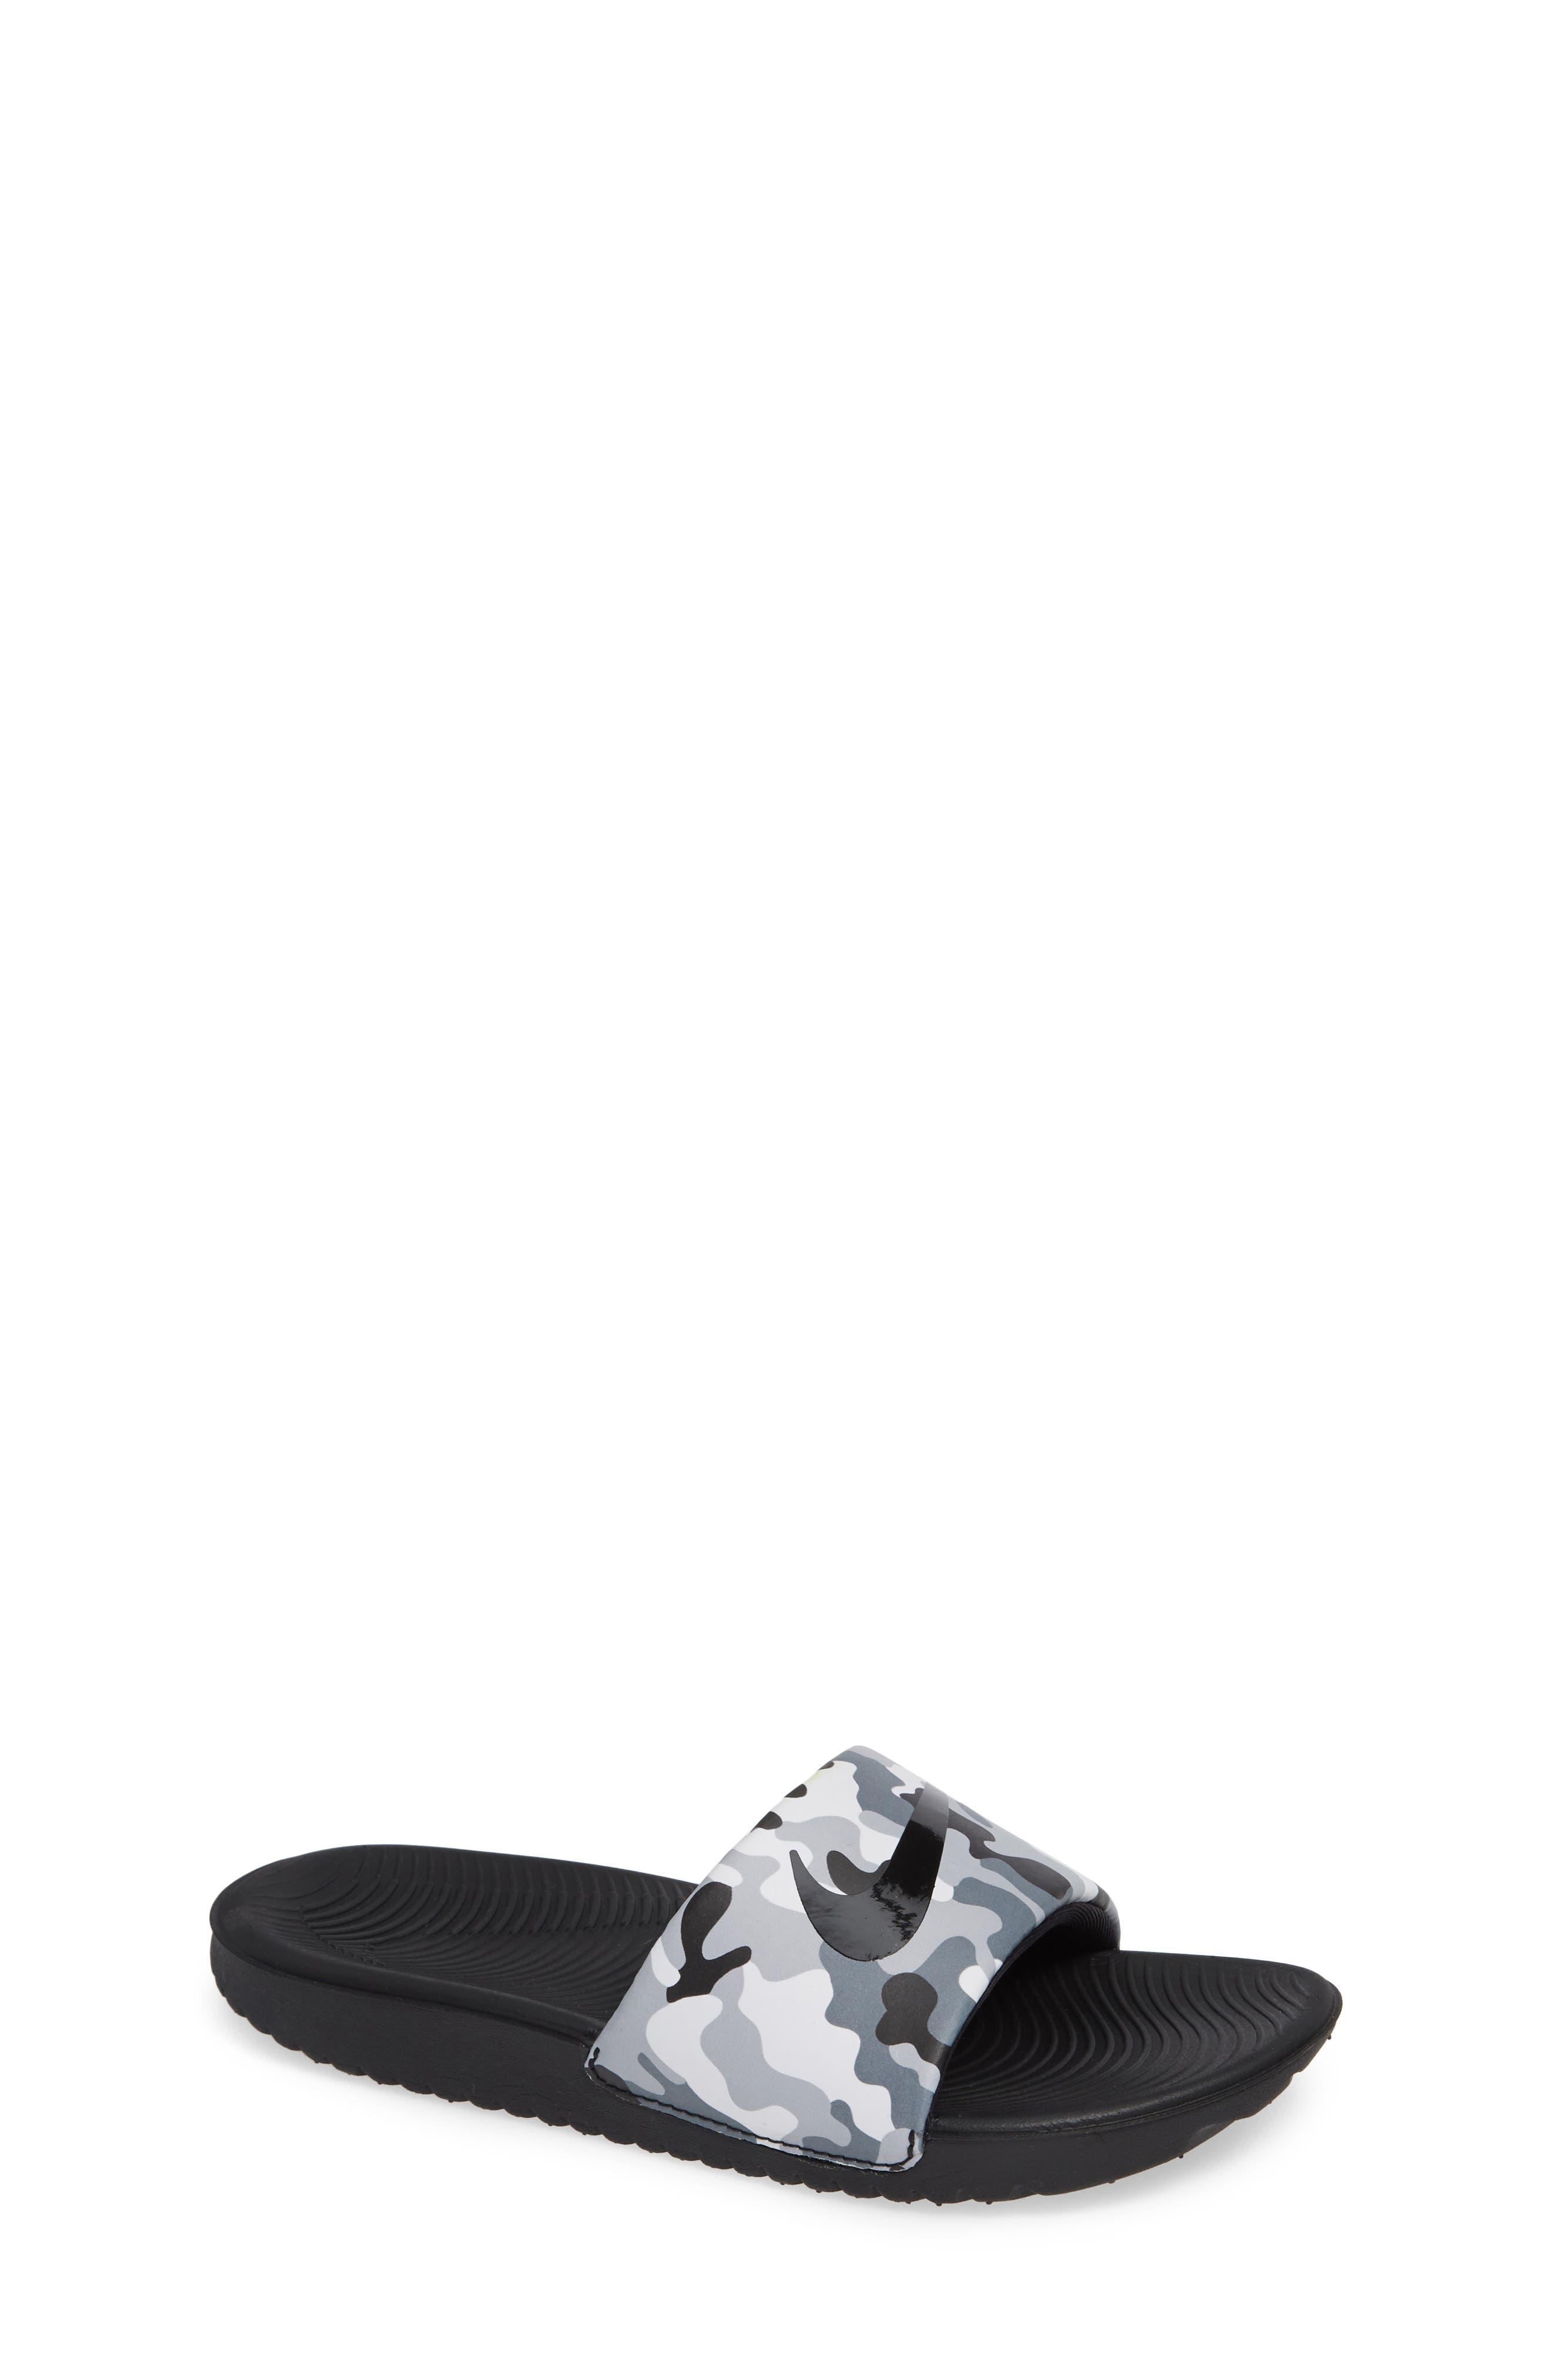 NIKE, Kawa Slide Sandal, Main thumbnail 1, color, WOLF GREY/ BLACK/ WHITE